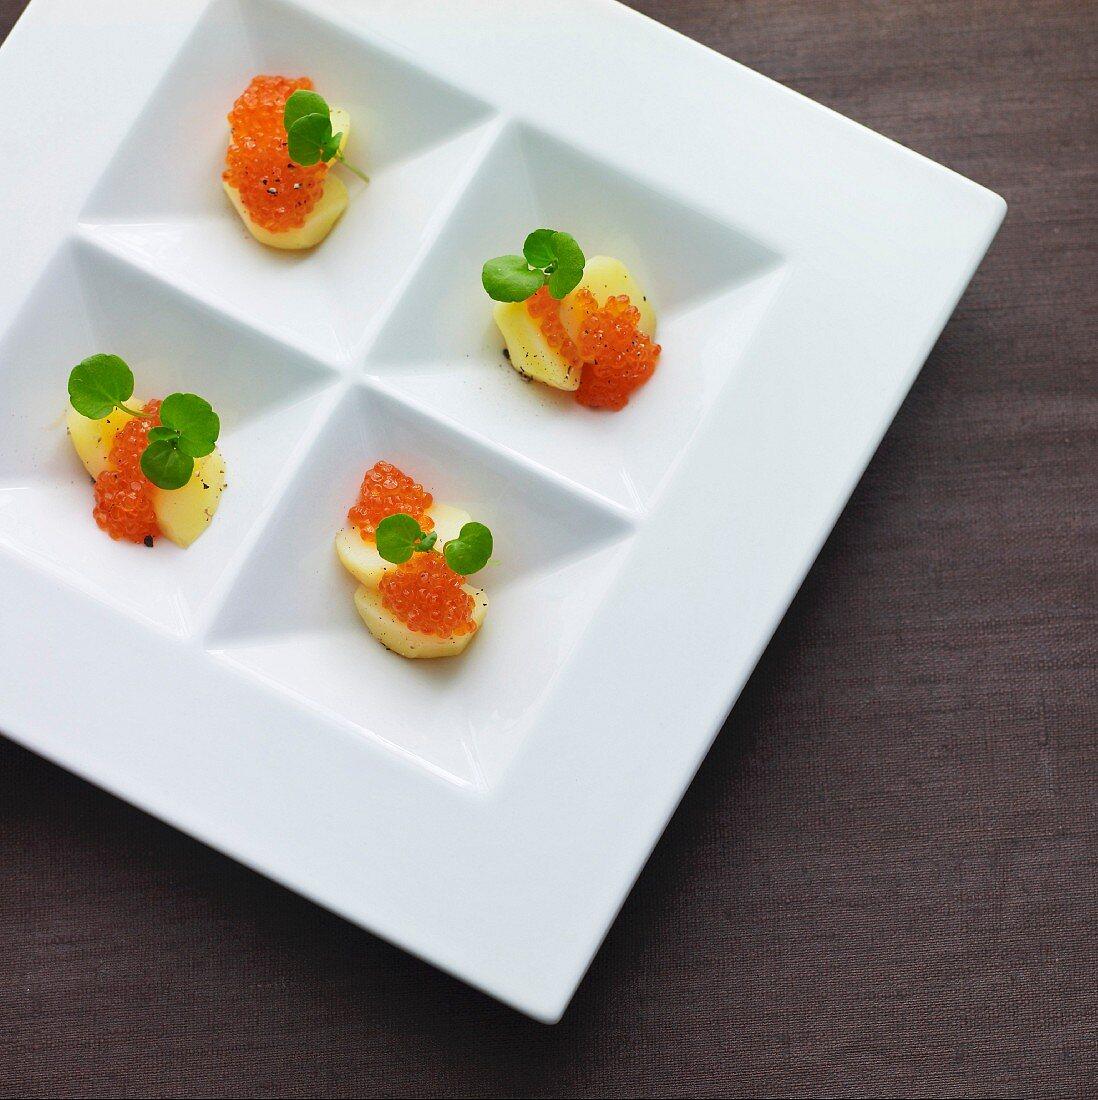 Chum salmon caviar on potato slices